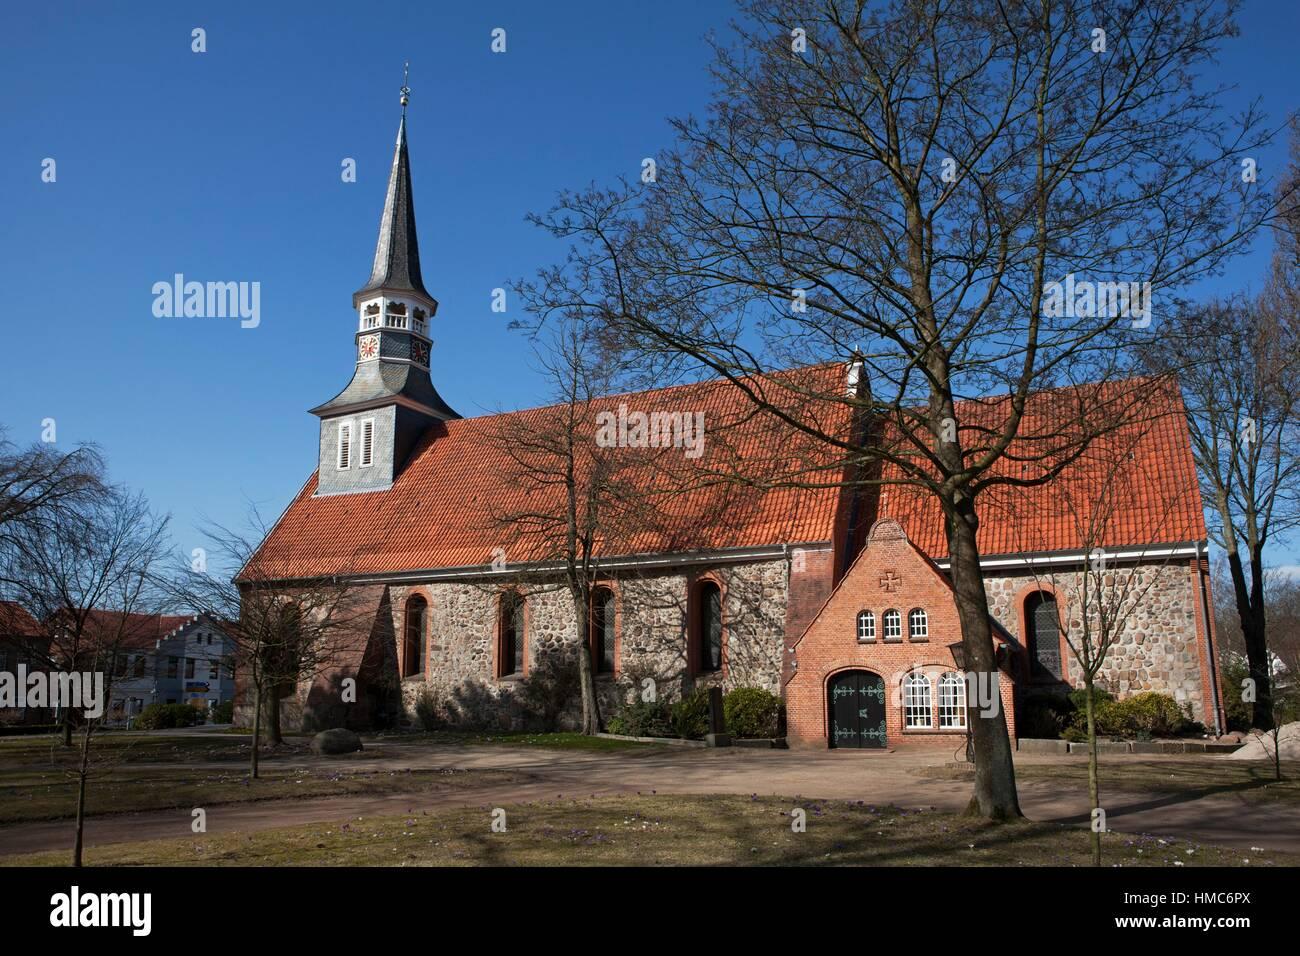 Stephanskirche Schenefeld